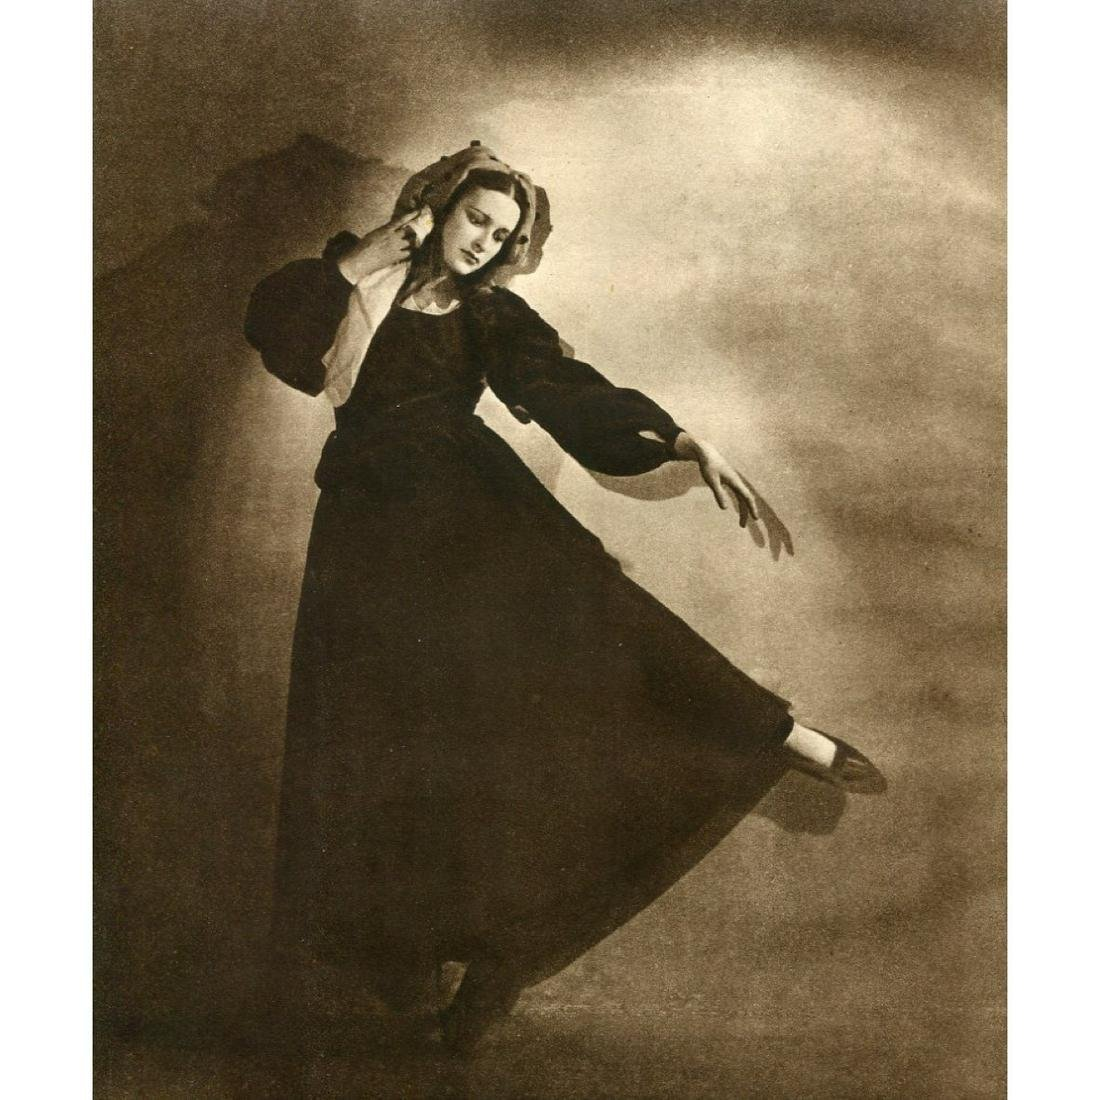 KAY AMBROSE - Ursula Moreton in Lord of Burleigh